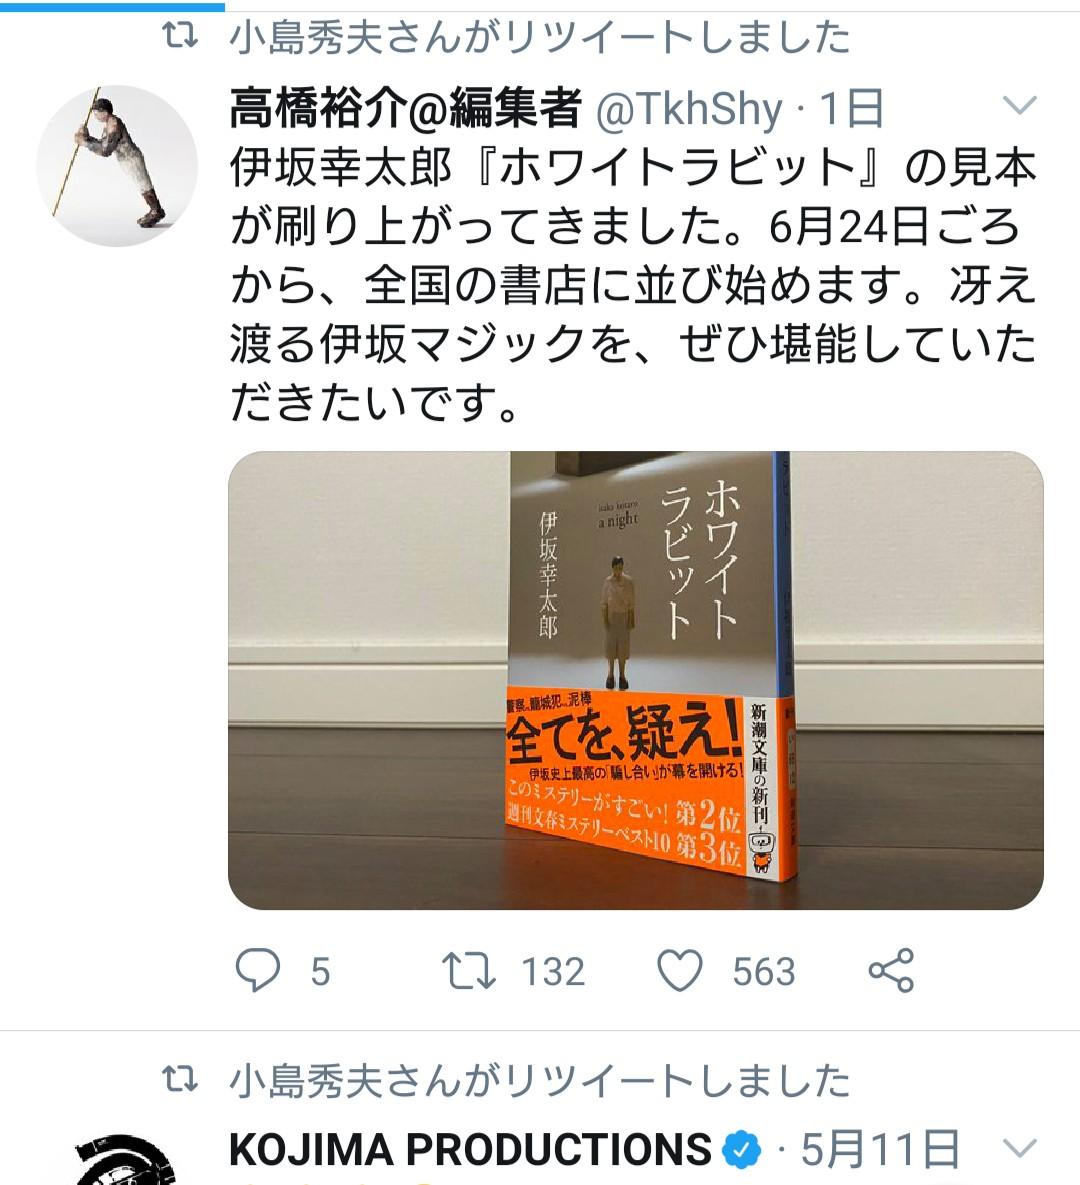 KqXkmM6 - 【朗報】小島監督が一ヶ月ぶりにツイッターを更新